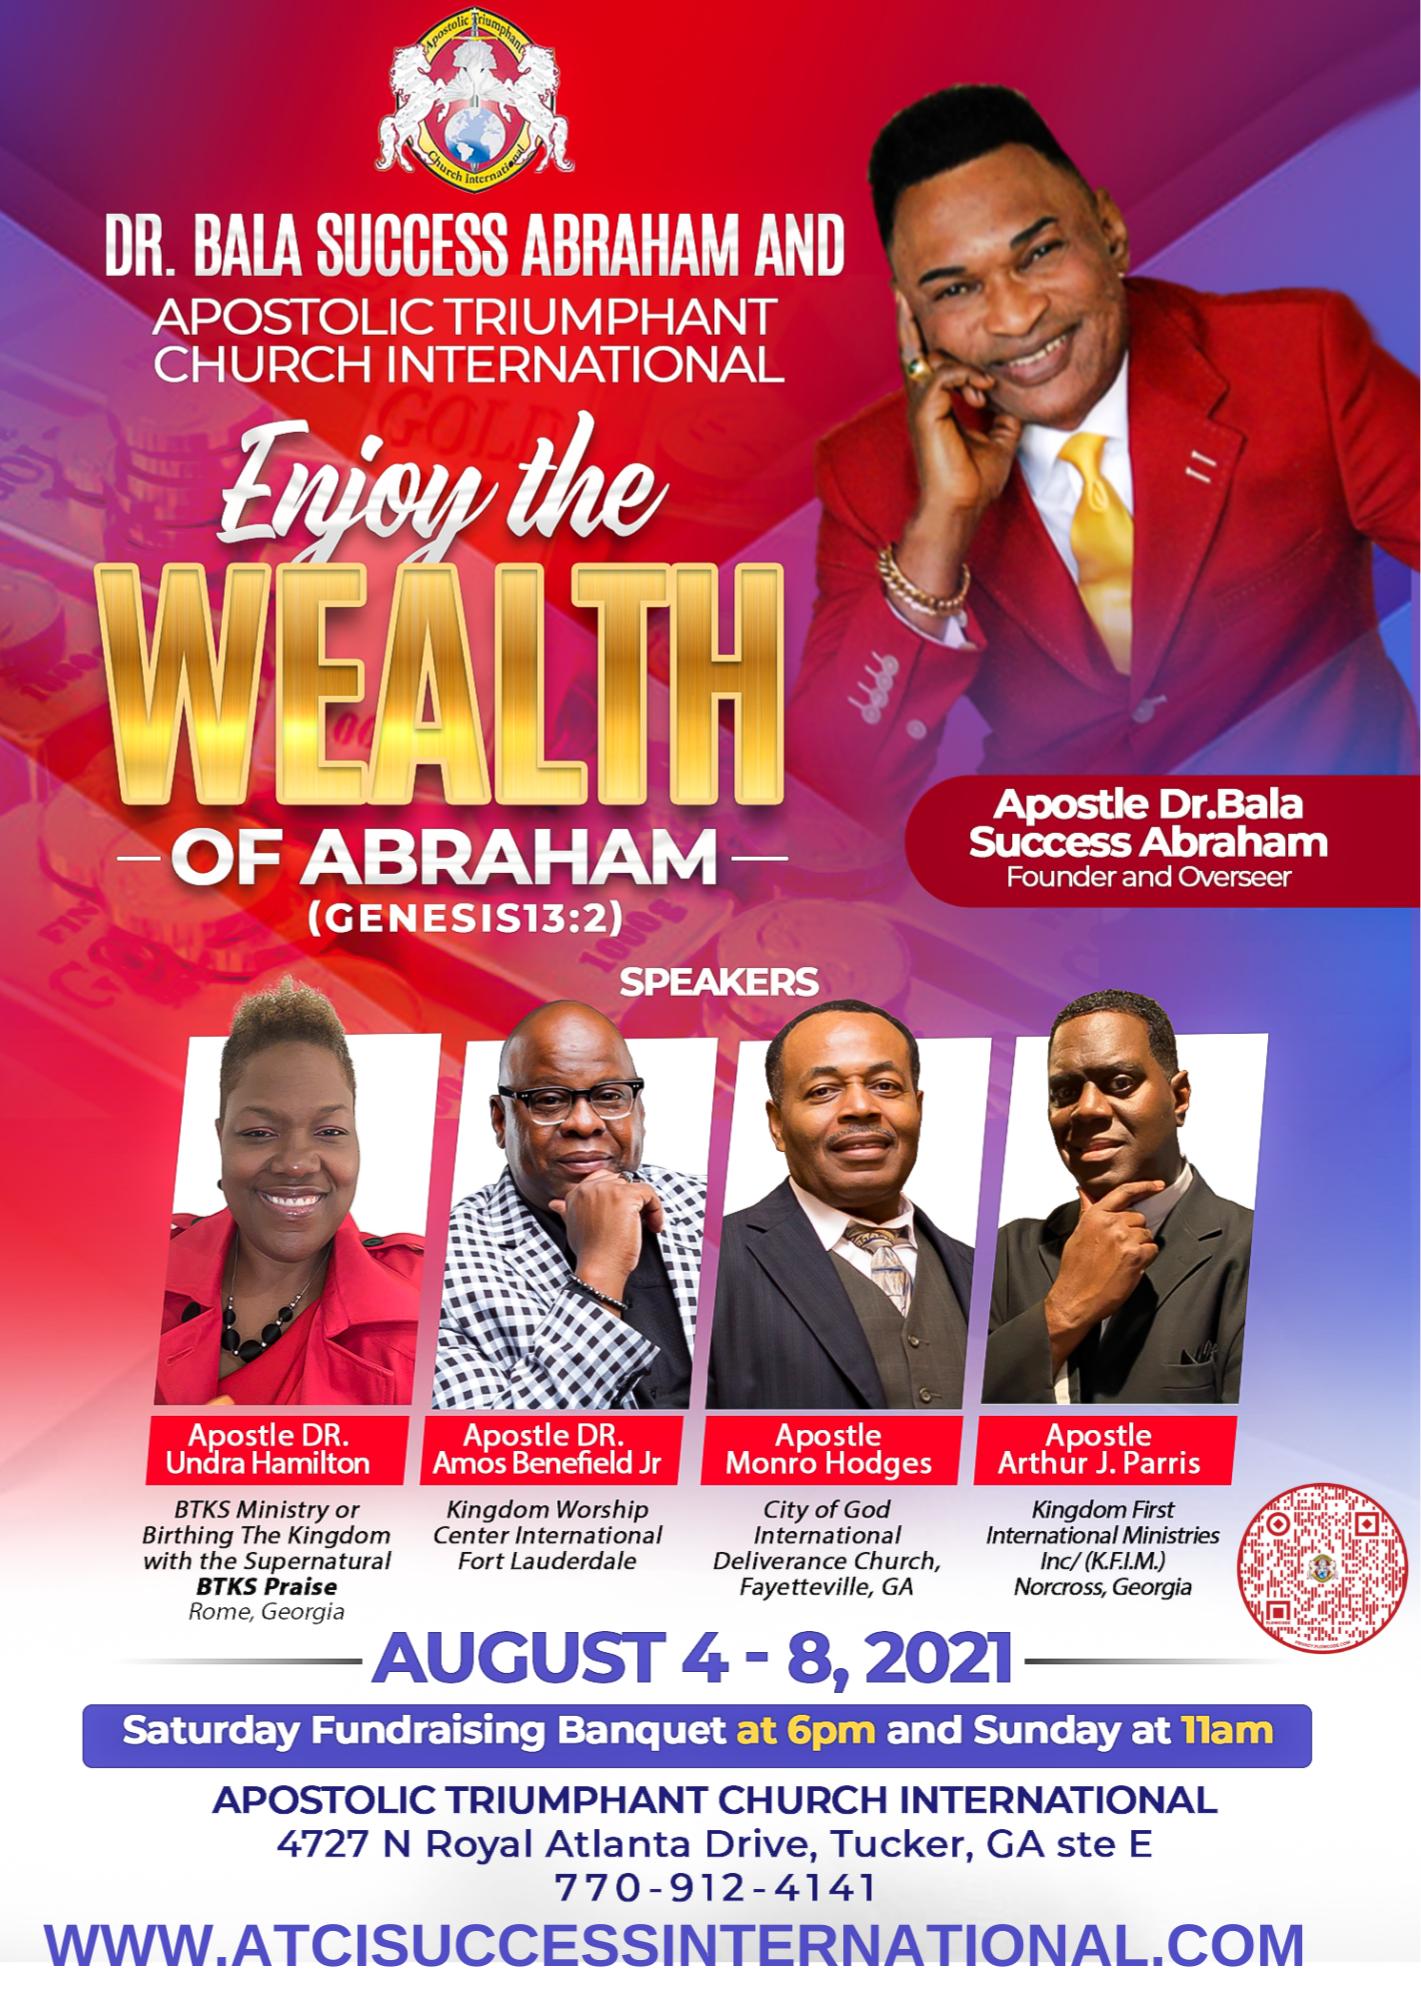 Enjoy the Wealth of Abraham